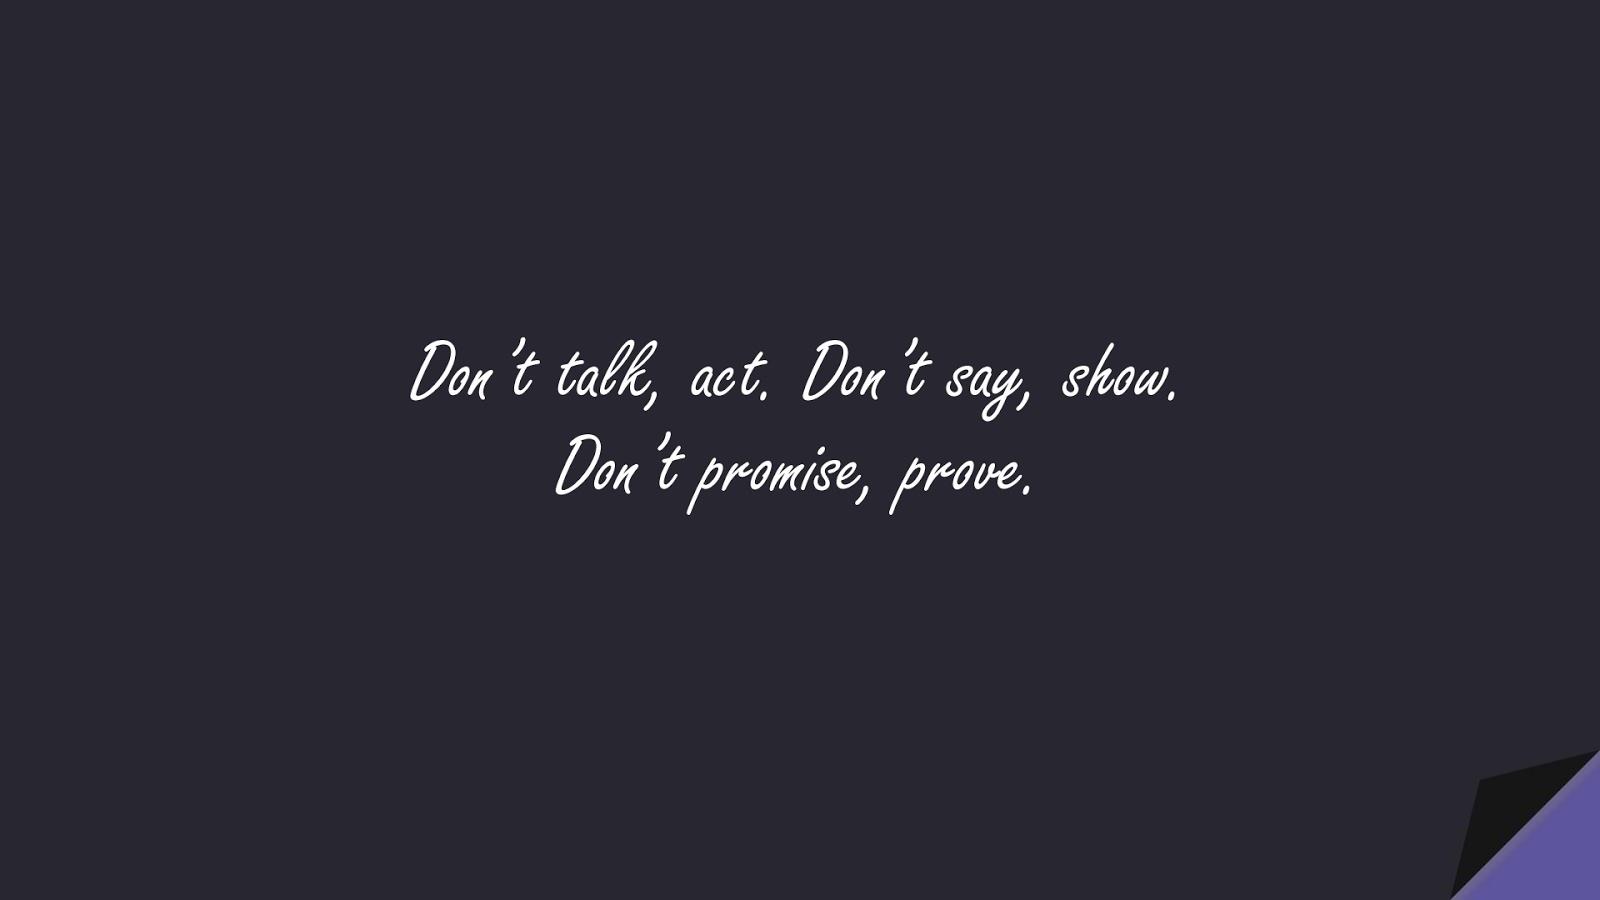 Don't talk, act. Don't say, show. Don't promise, prove.FALSE